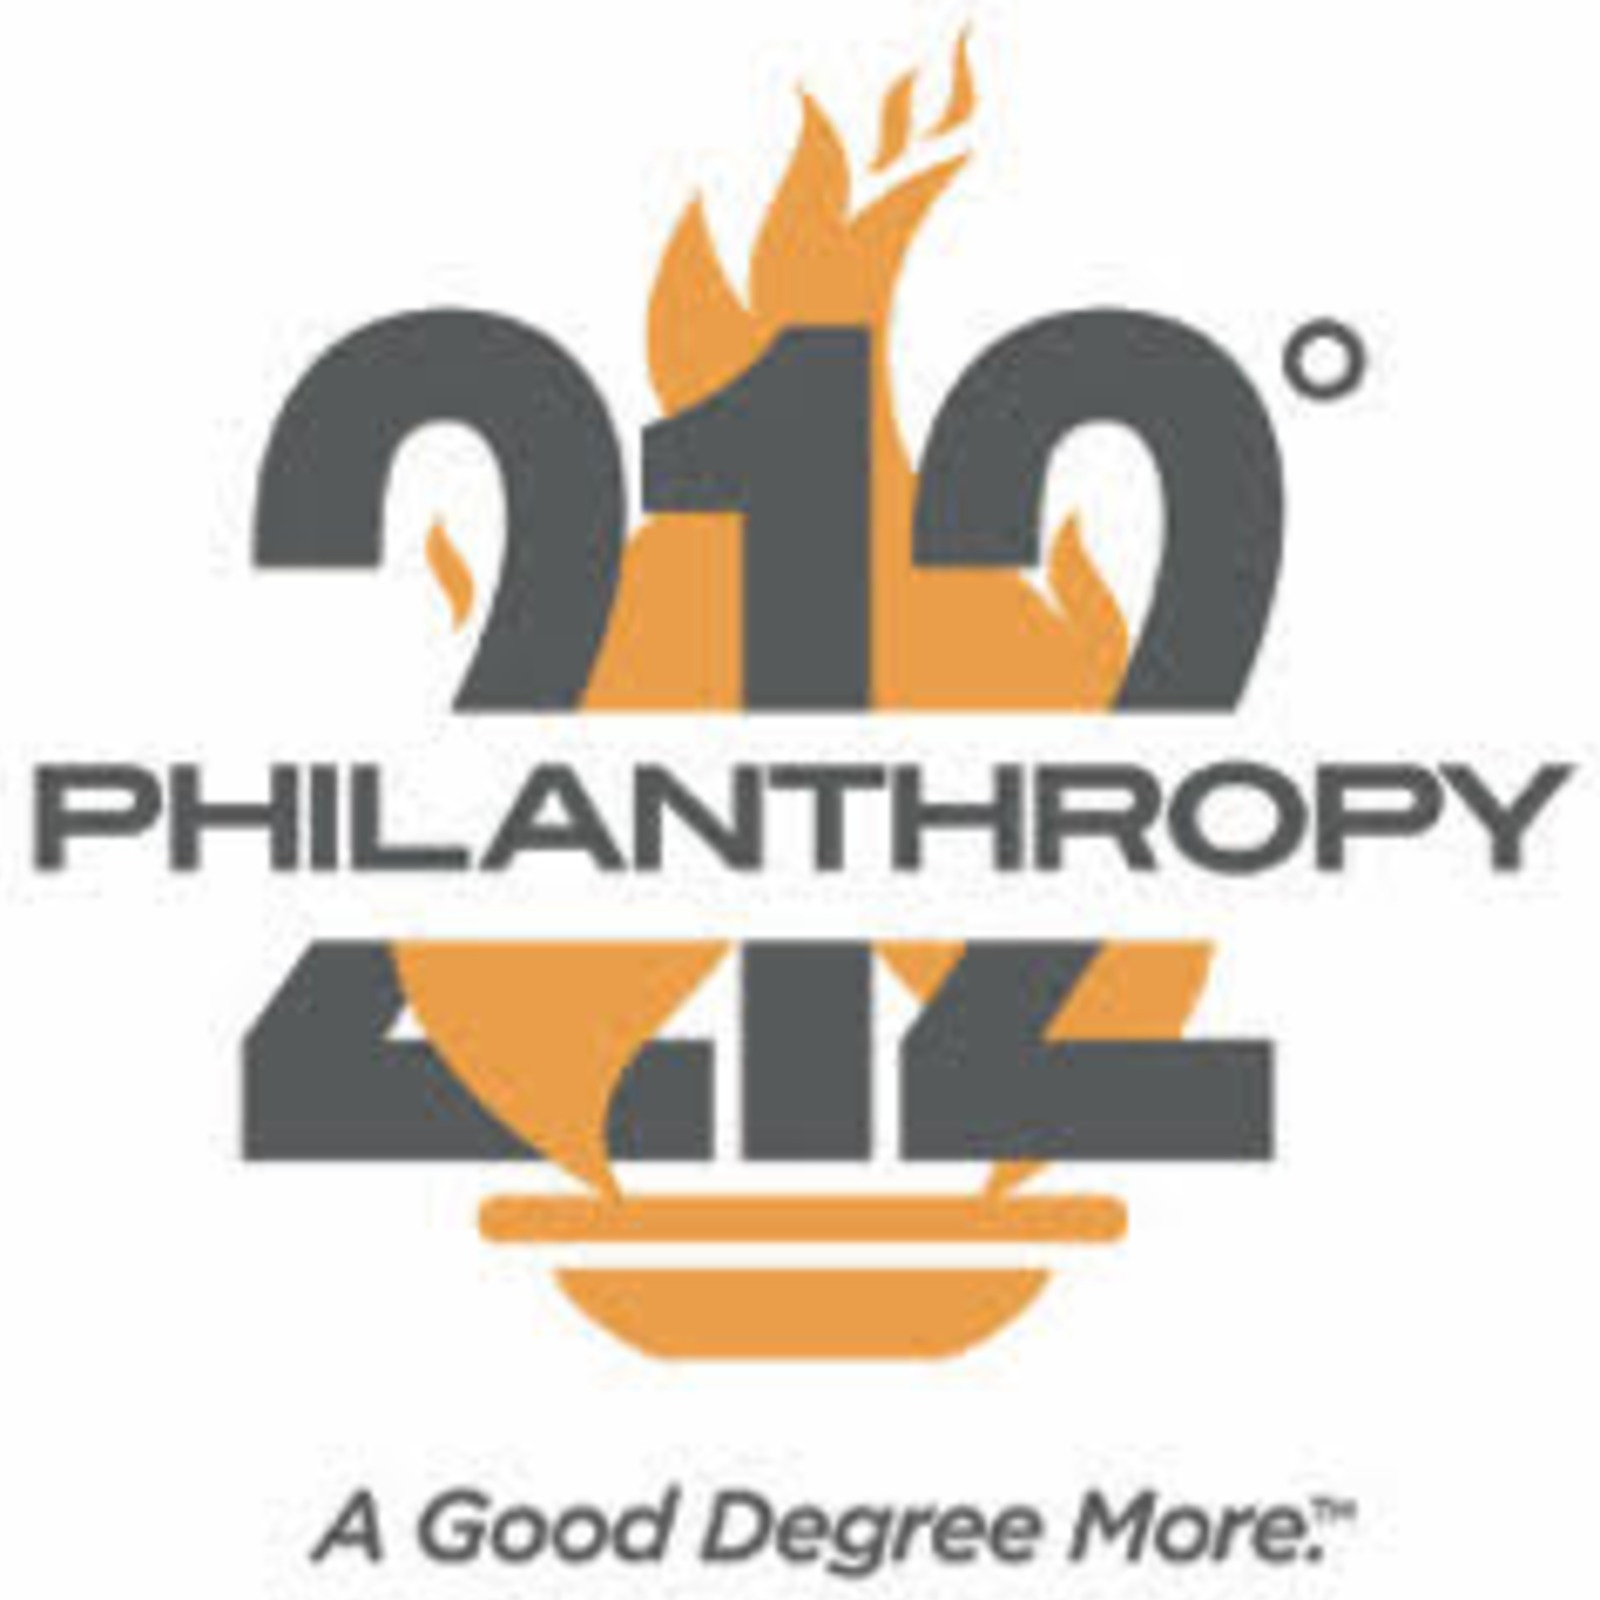 The Philanthropy212 Podcast show art